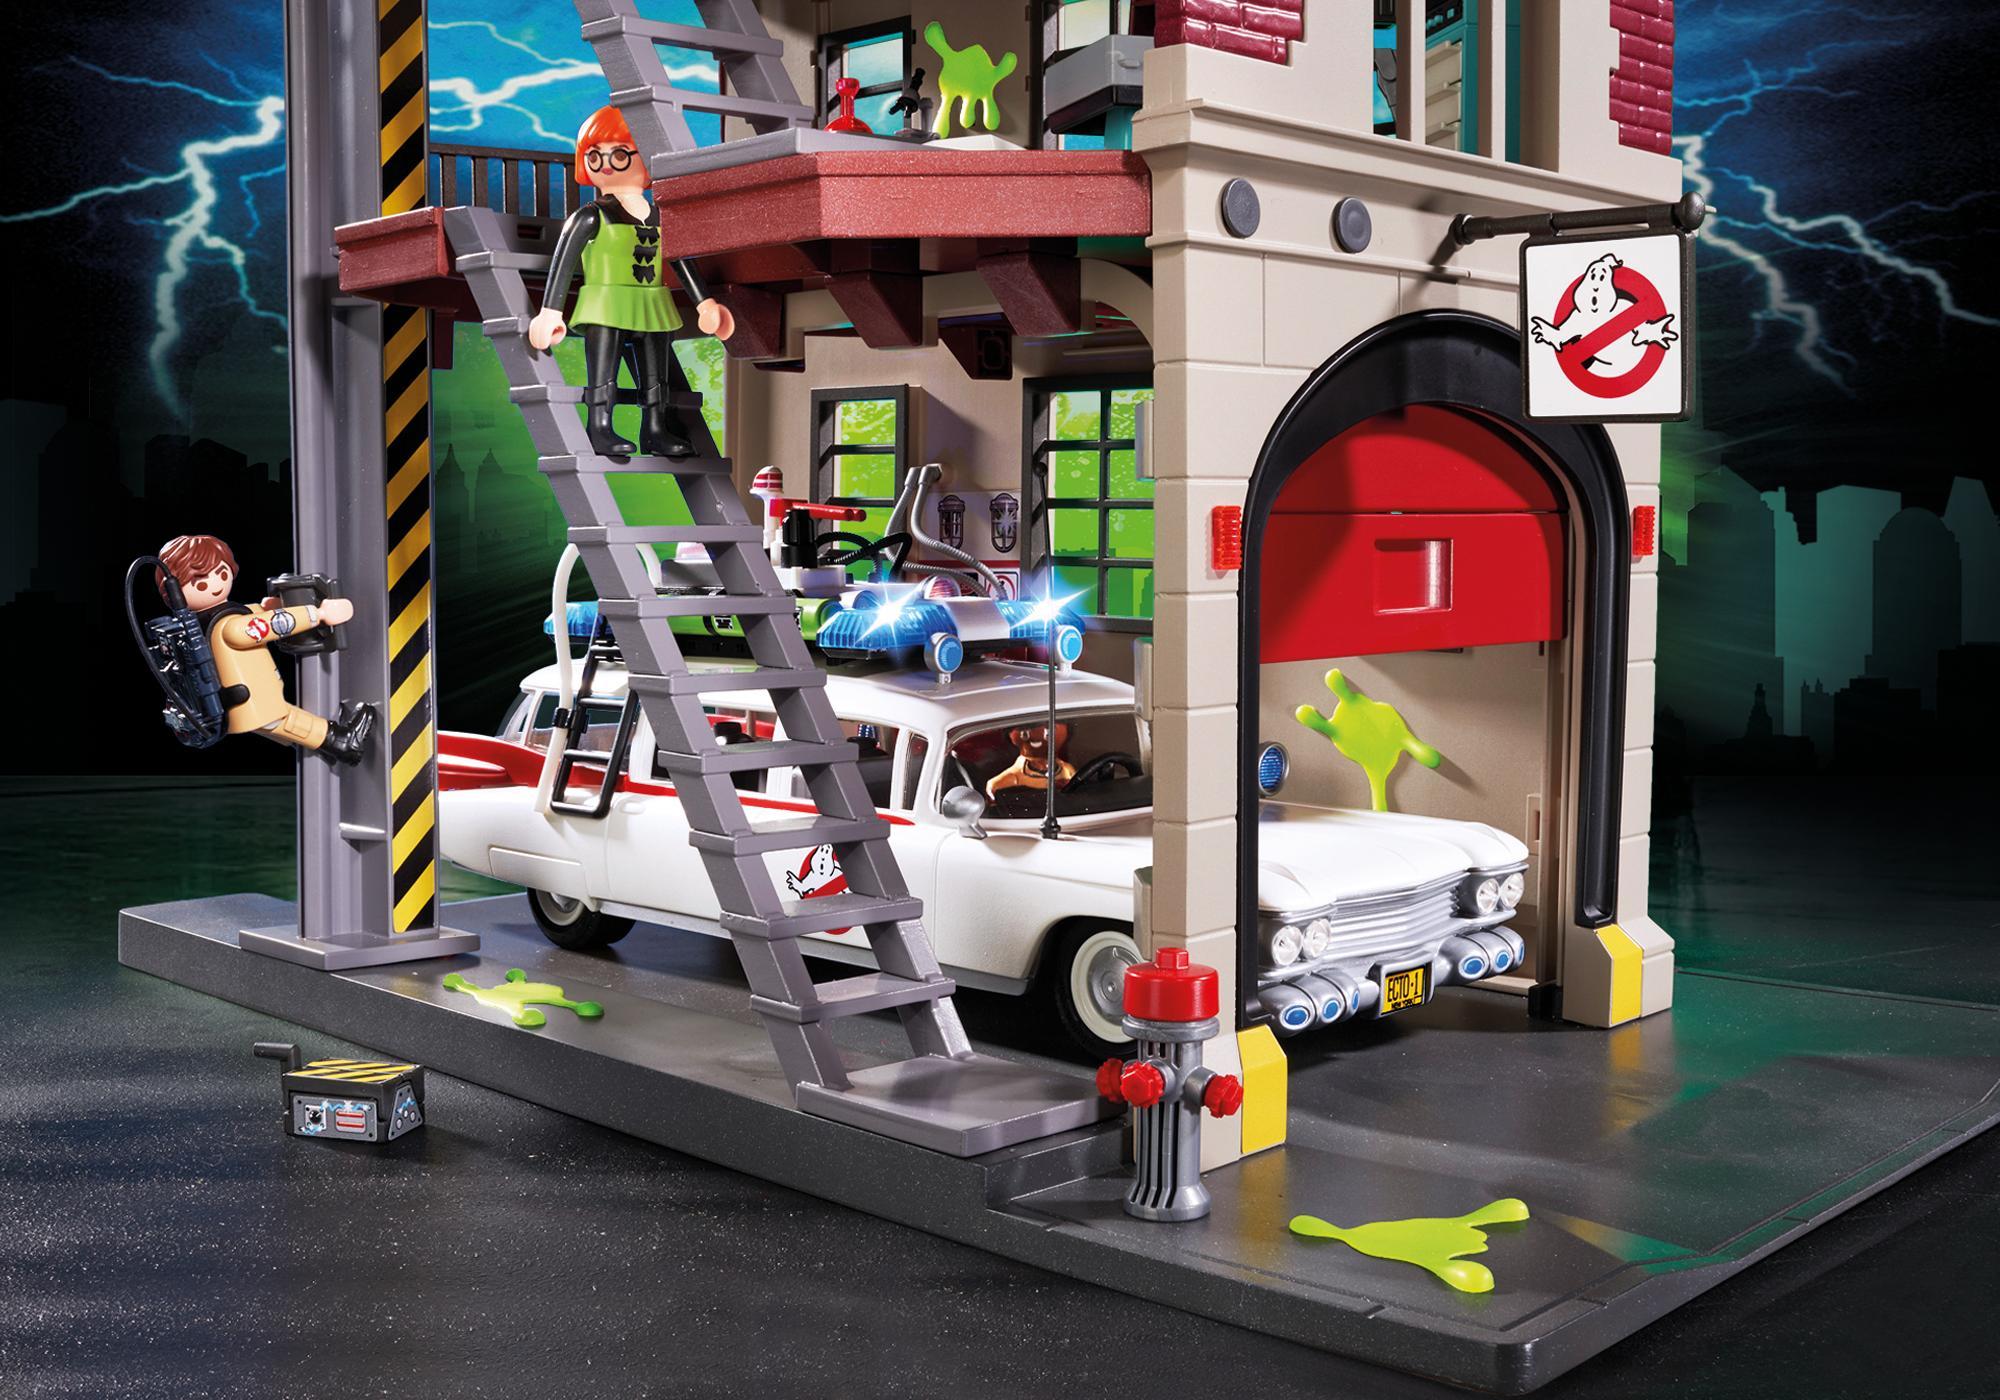 http://media.playmobil.com/i/playmobil/9220_product_extra1/Ghostbusters™ Ecto-1